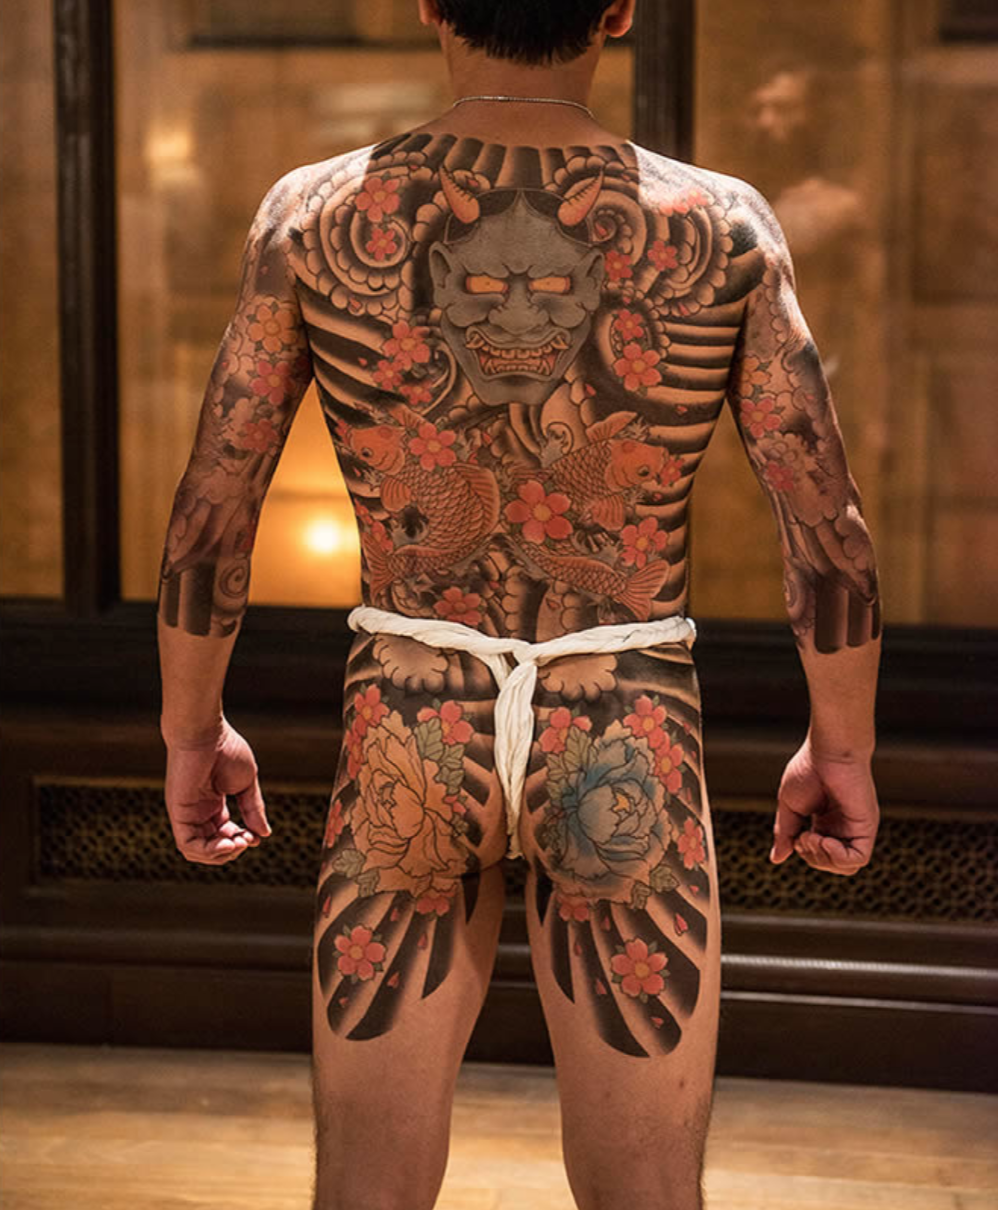 16 Fascinating Yakuza Tattoos and Their Hidden Symbolic